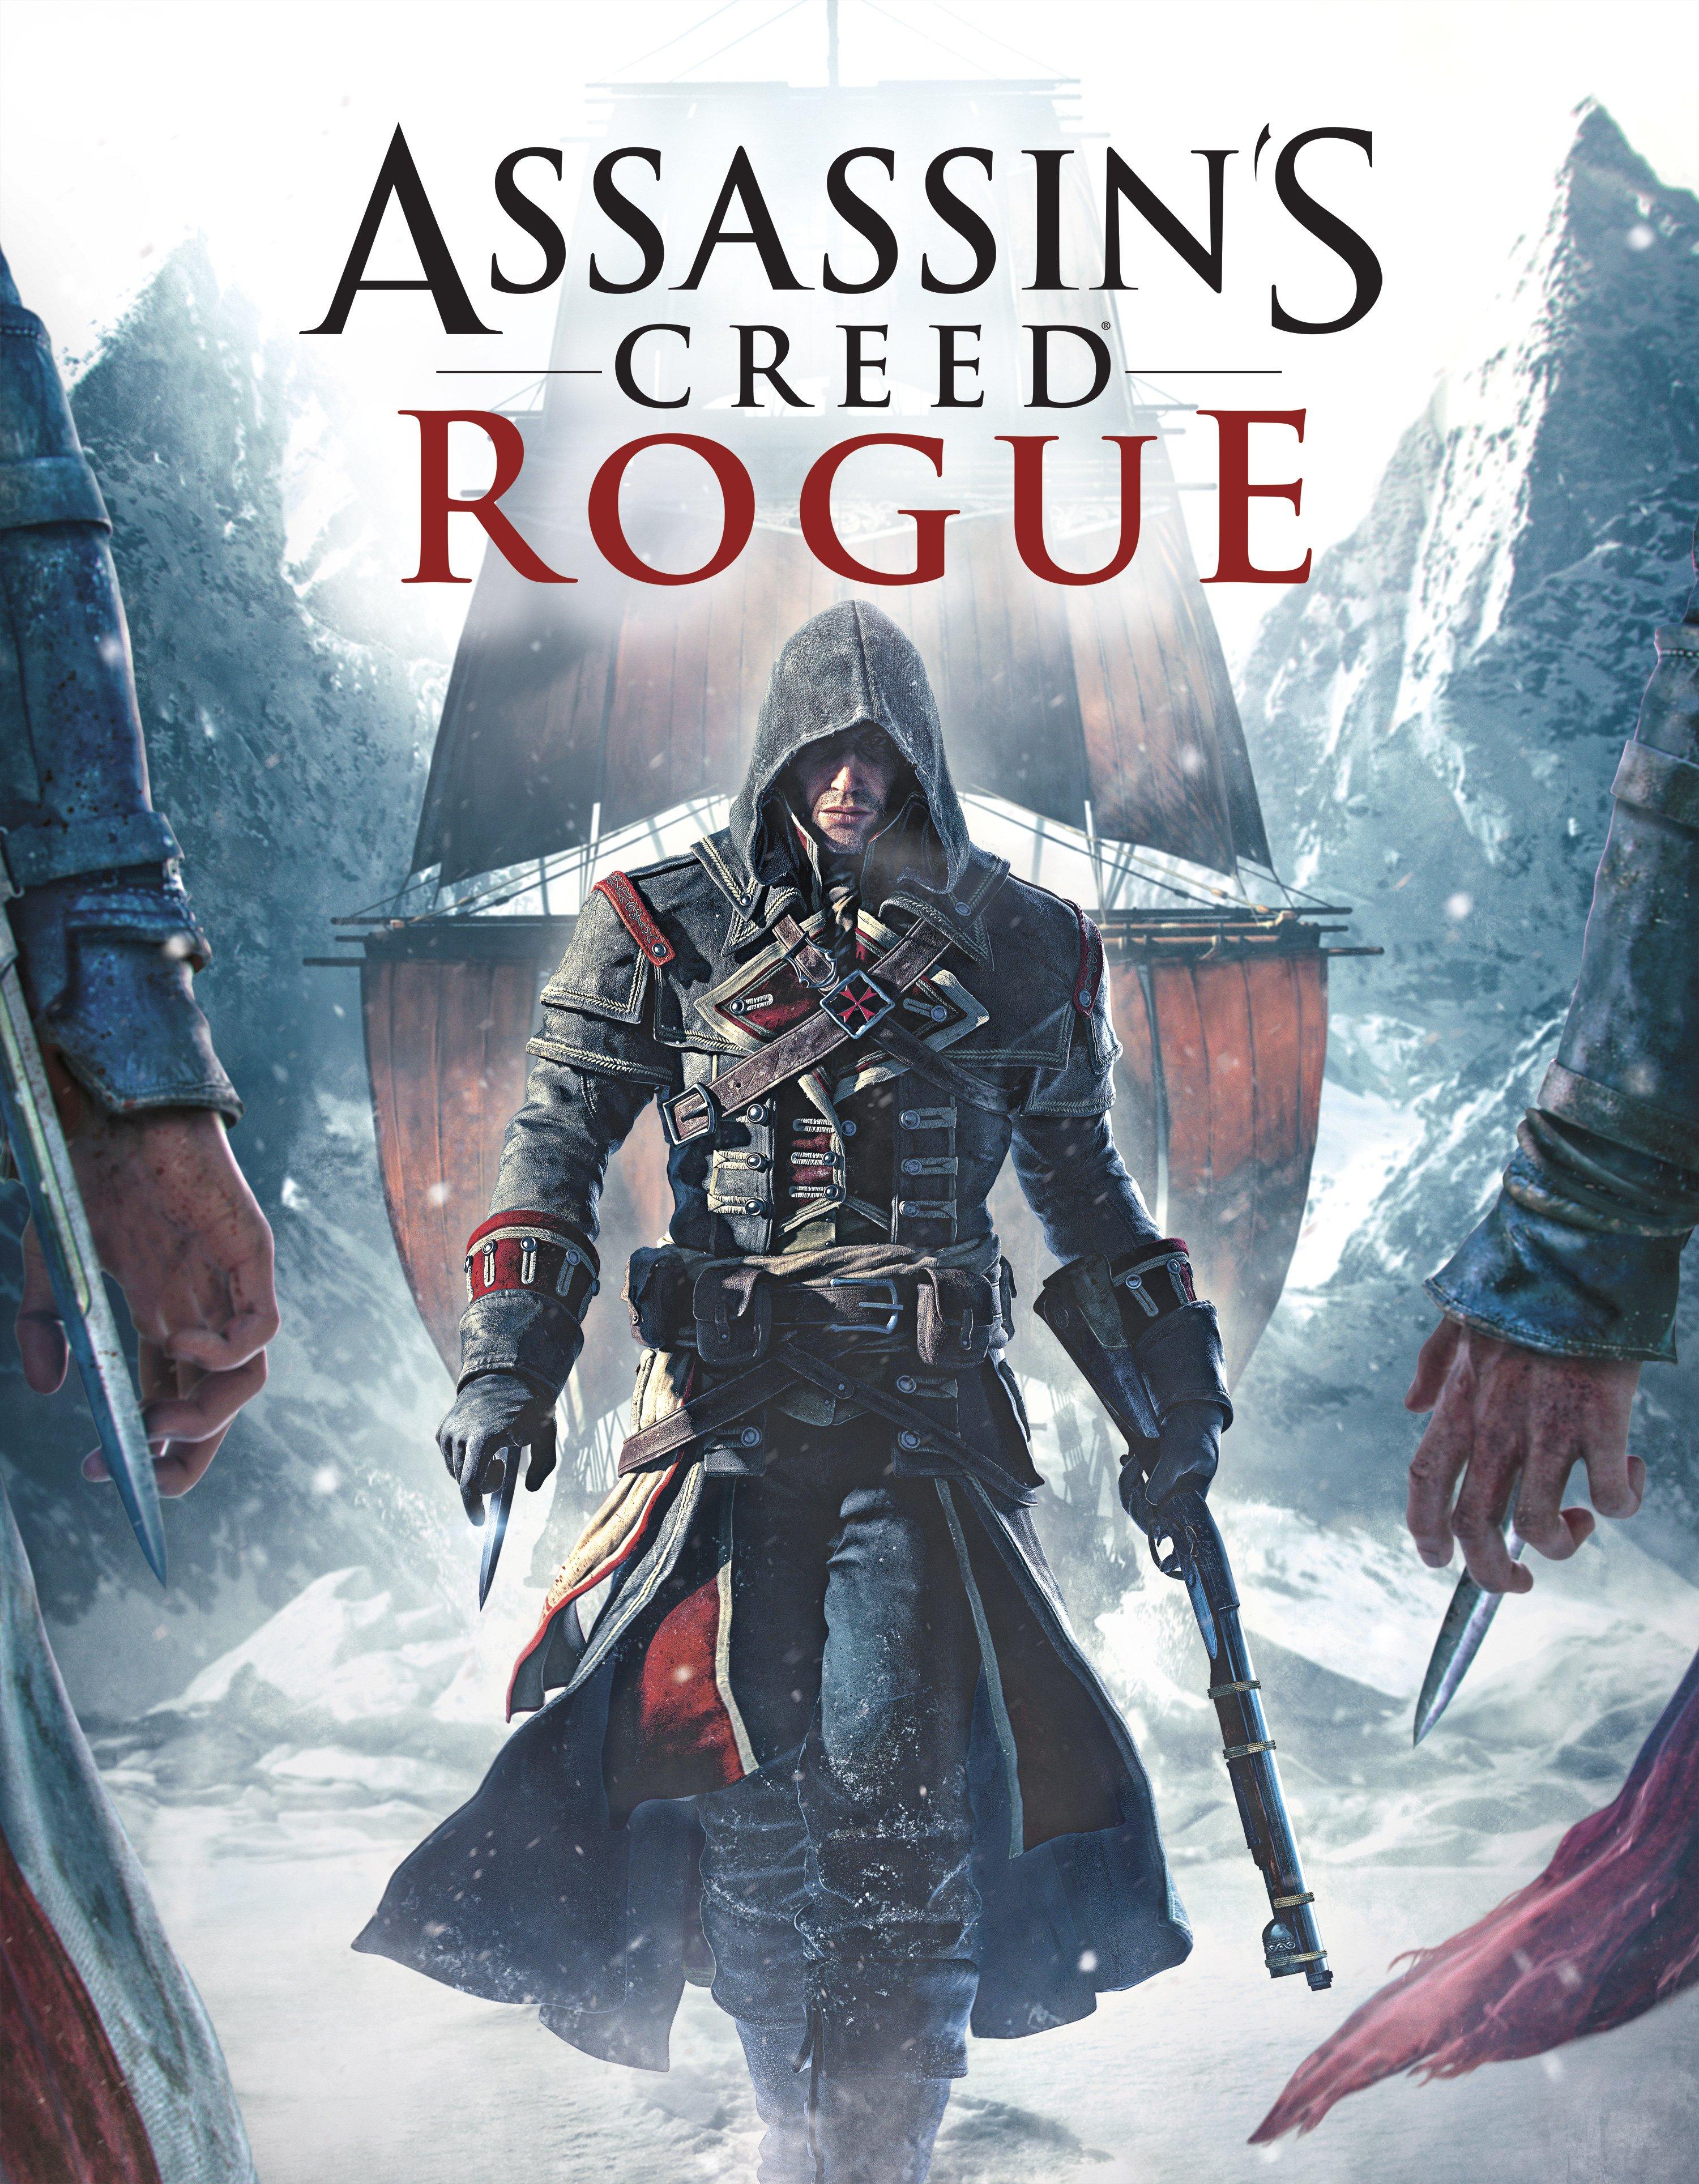 Assassins Creed Rogue Gameplay